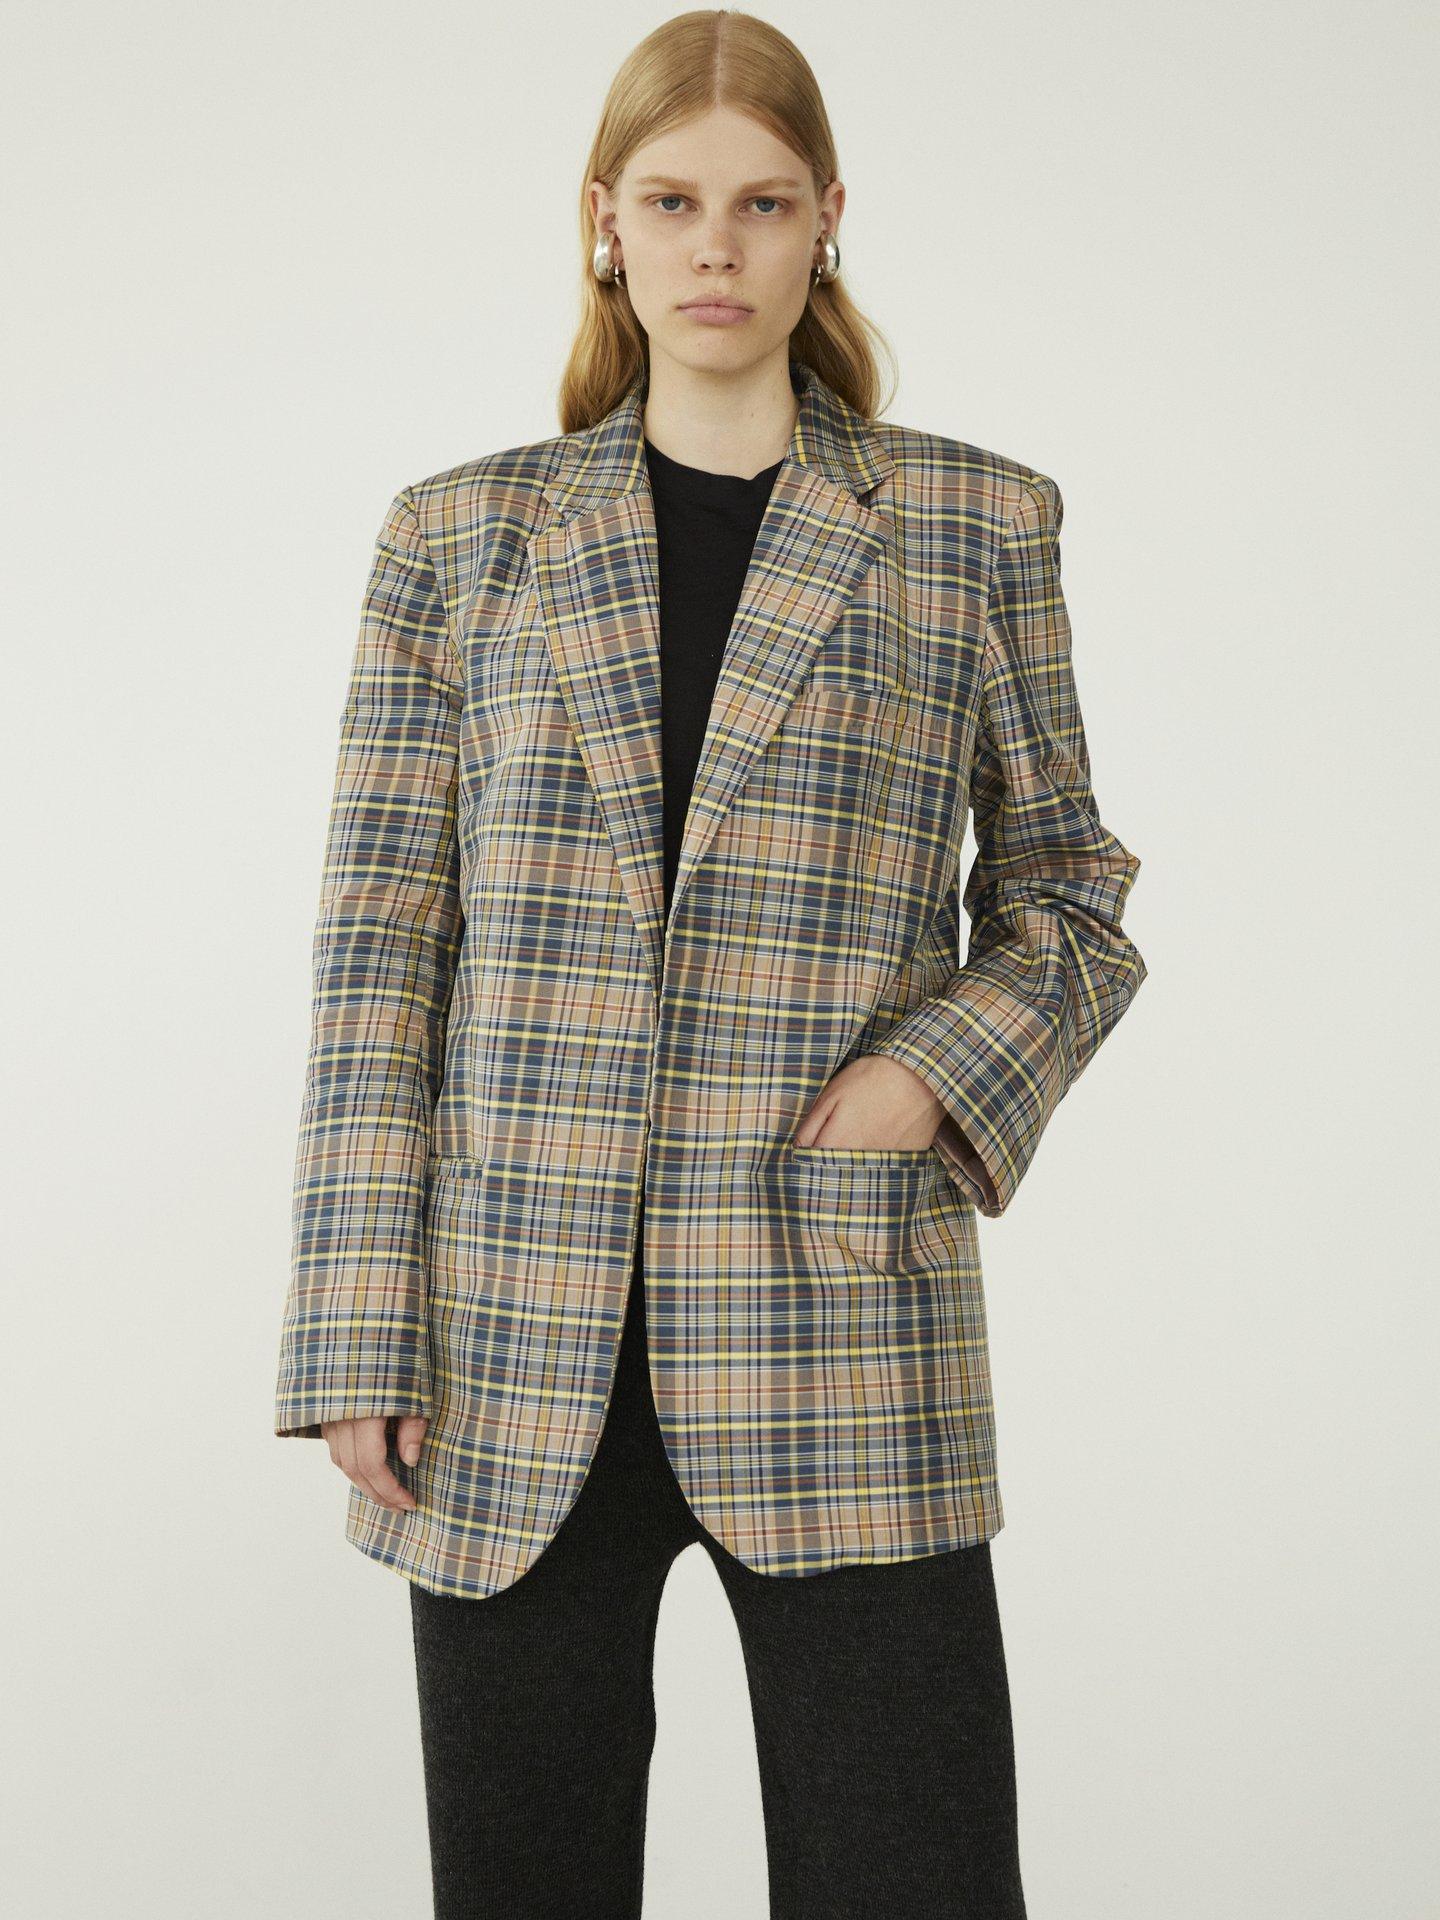 Suit_Blazer-Jacket-SI-P1P-JACK-BLAZE-Checkered_1440x.progressive.jpg